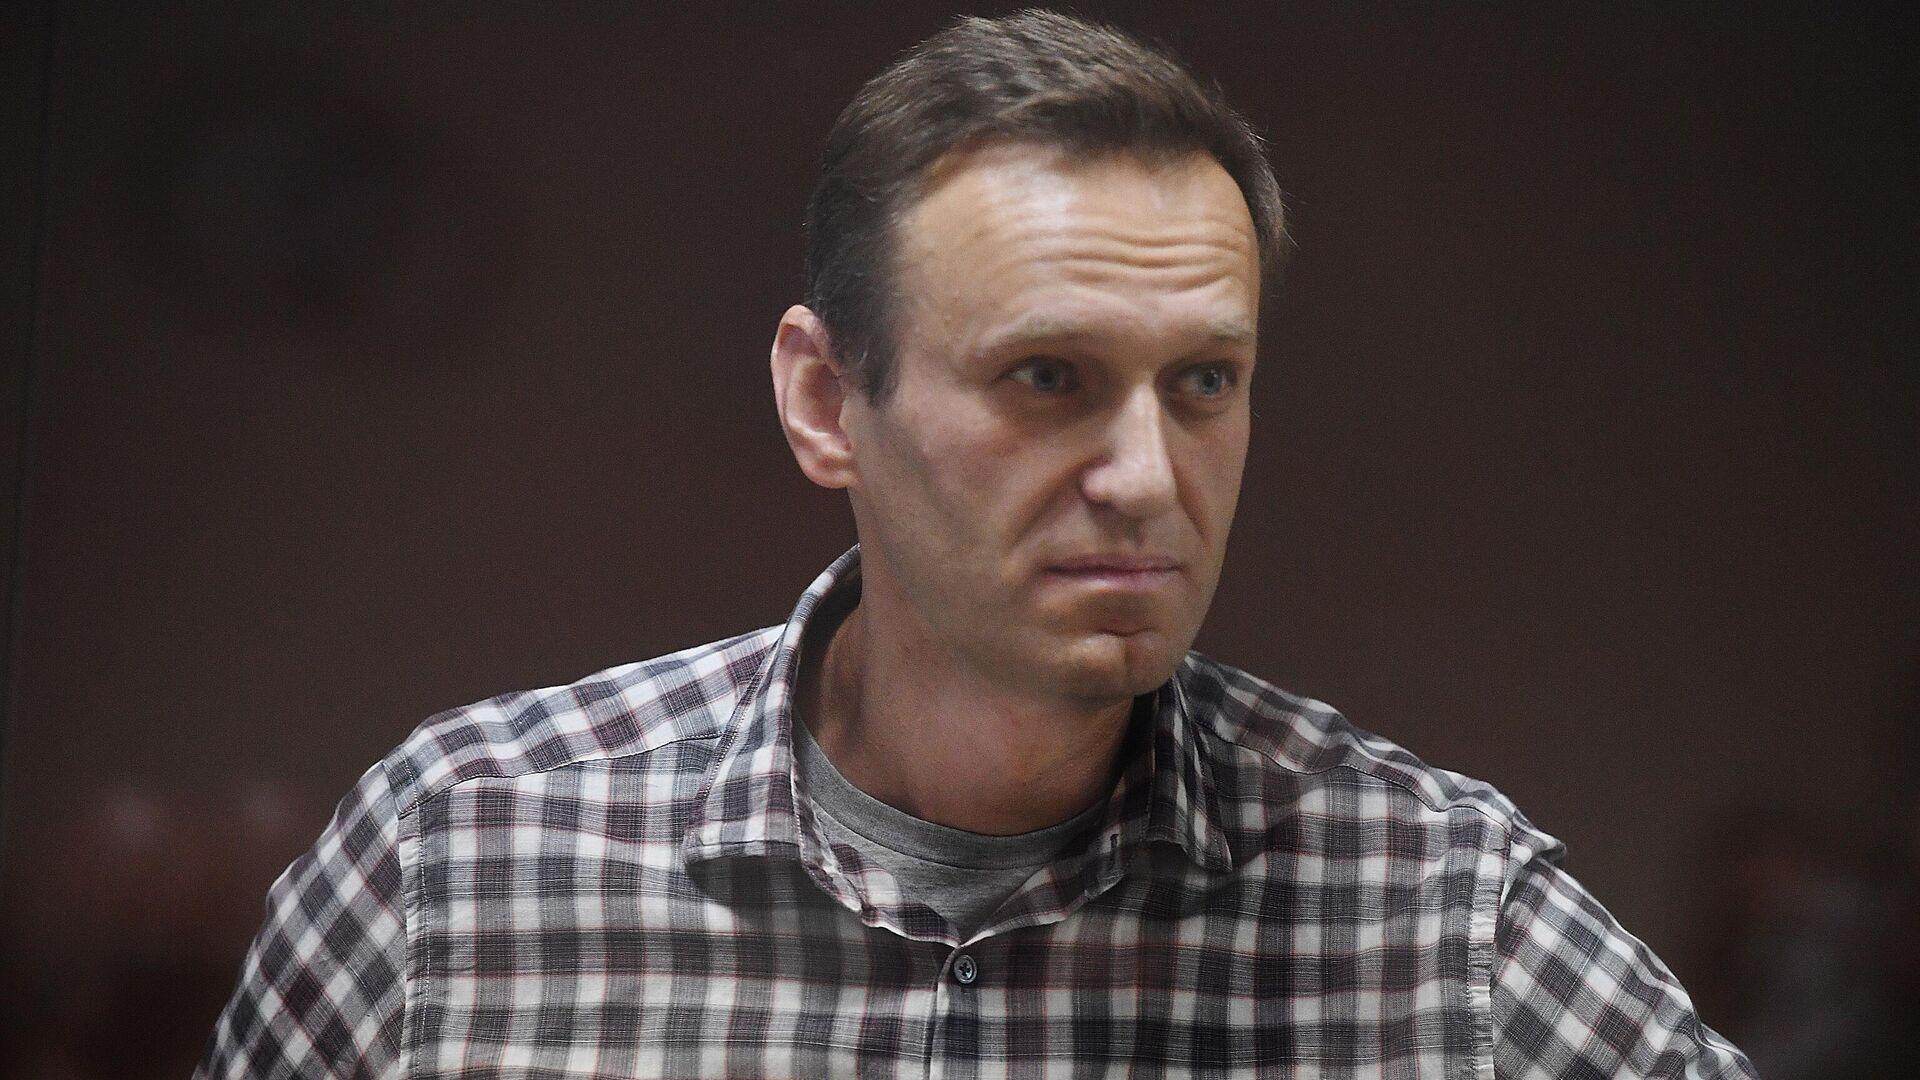 Alexéi Navalni, bloguero opositor ruso - Sputnik Mundo, 1920, 01.04.2021